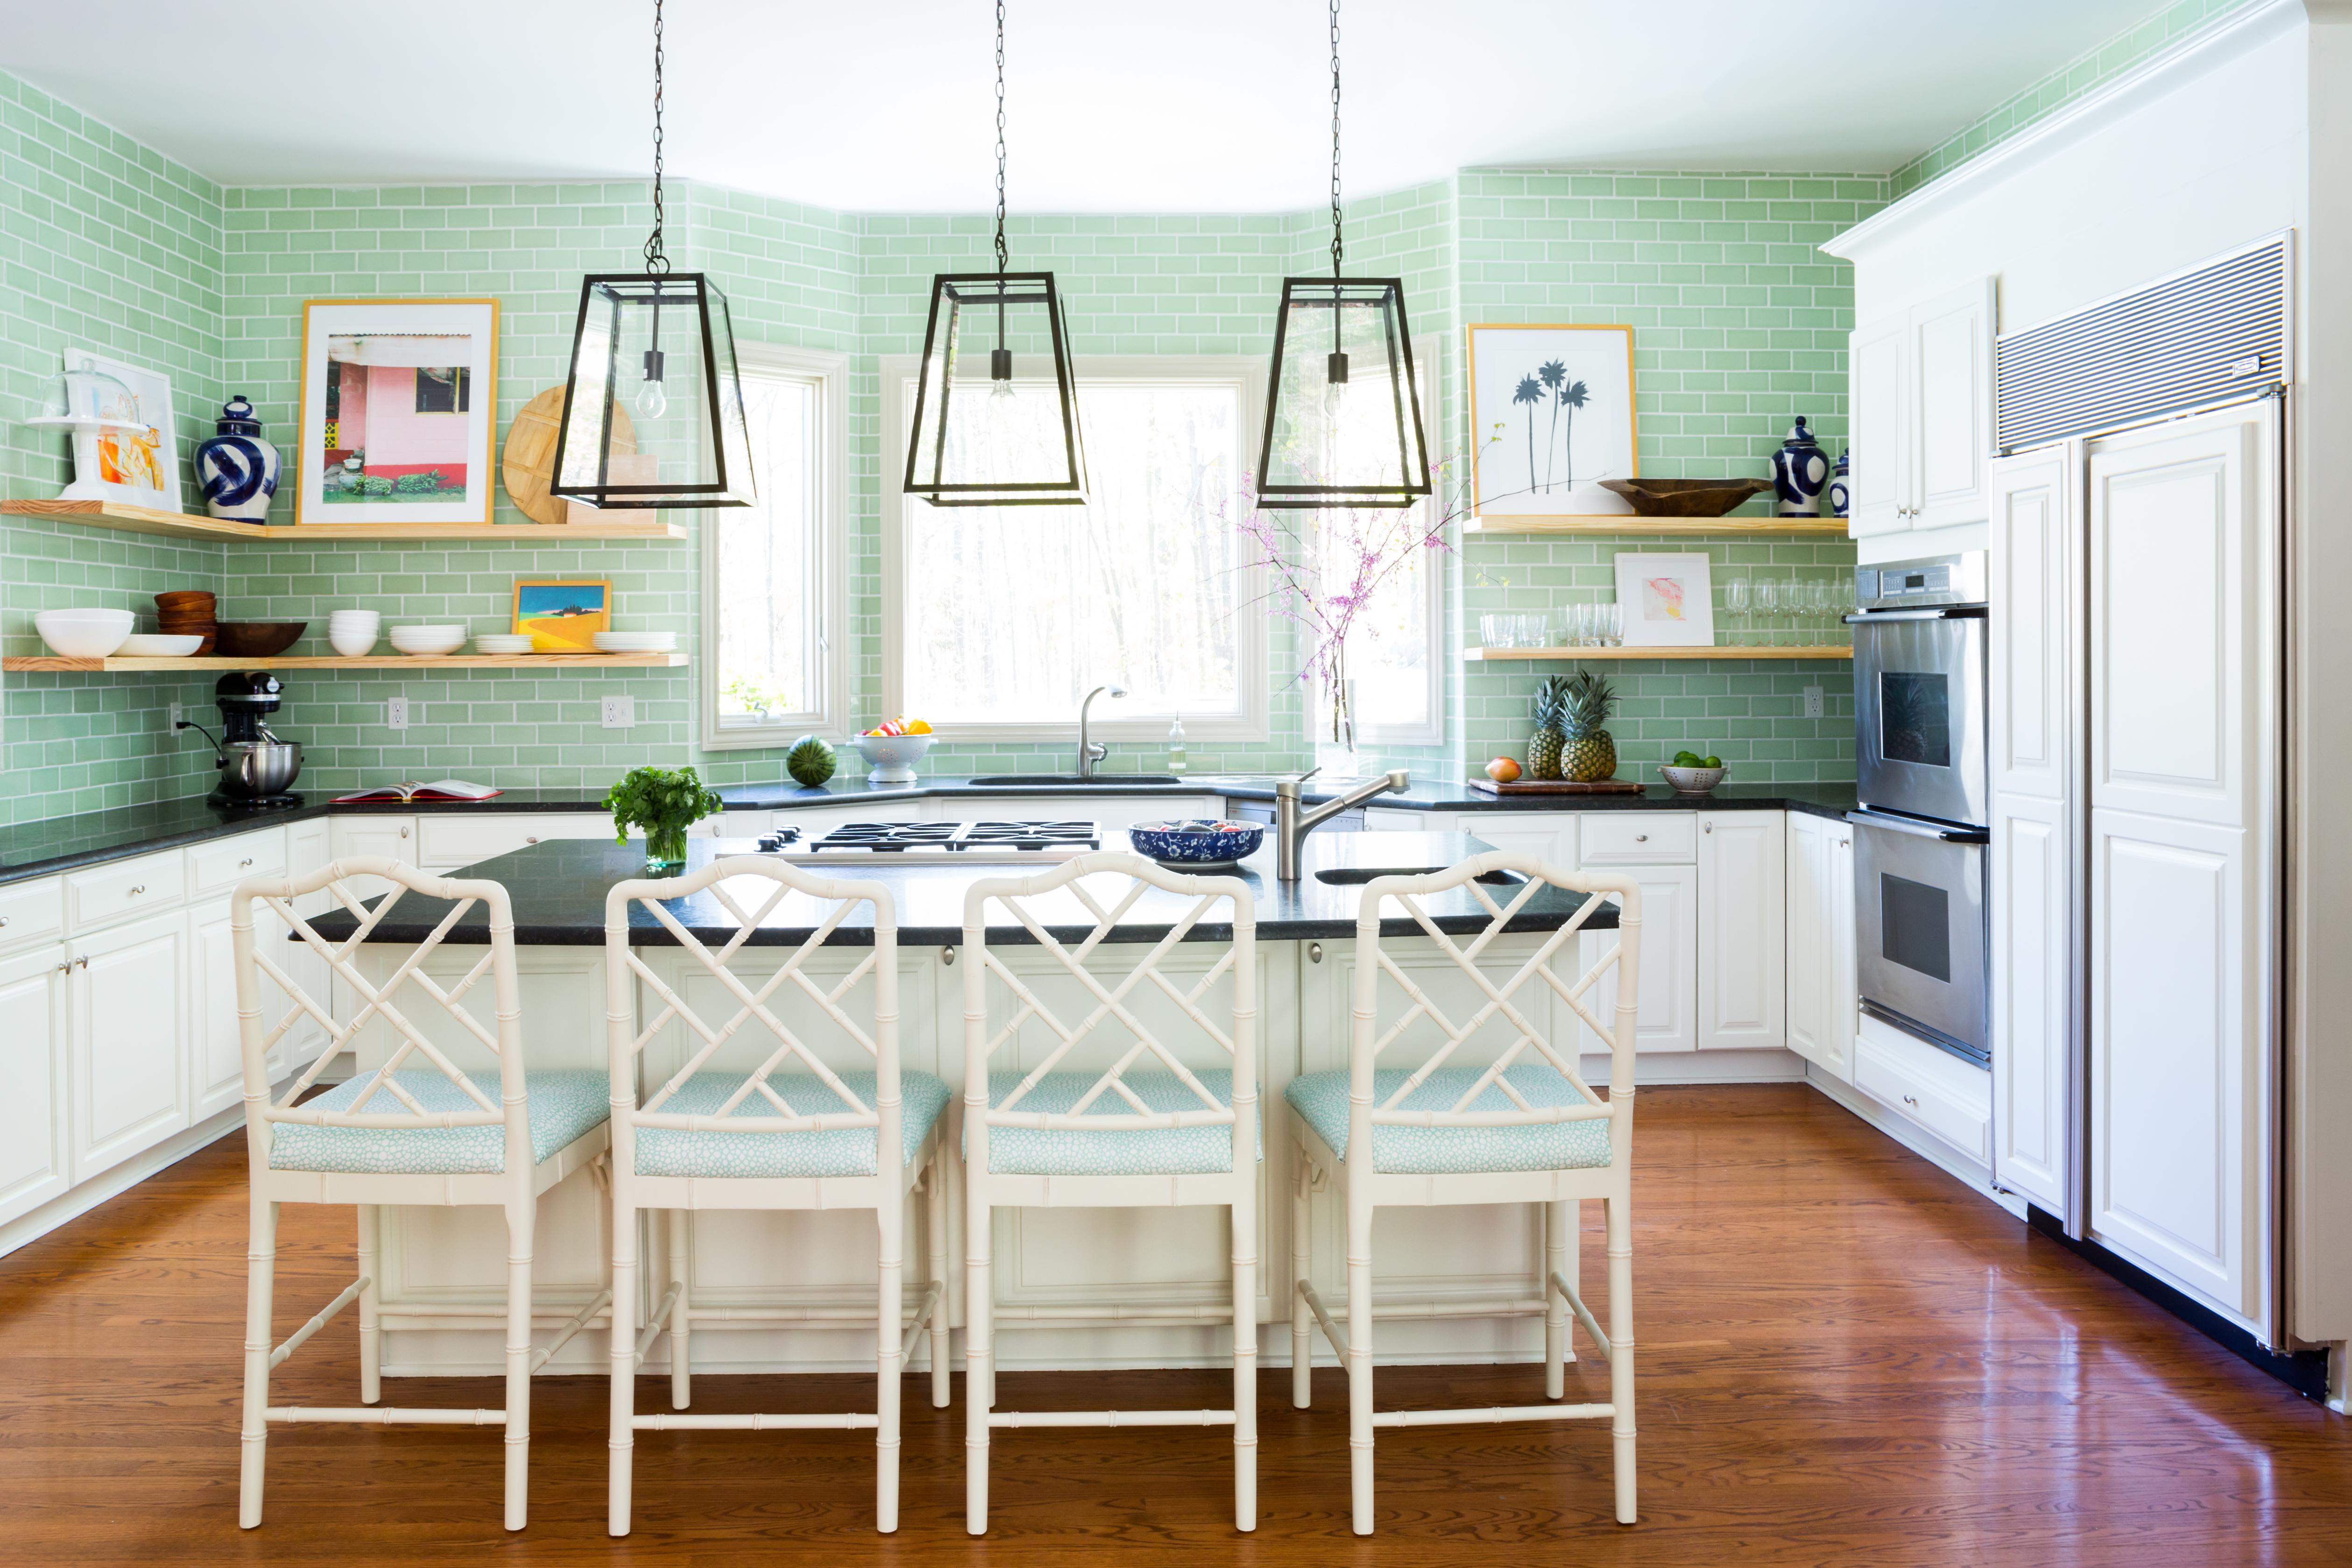 Kiwi 3x6 Fireclay Tile Kitchen Backsplash